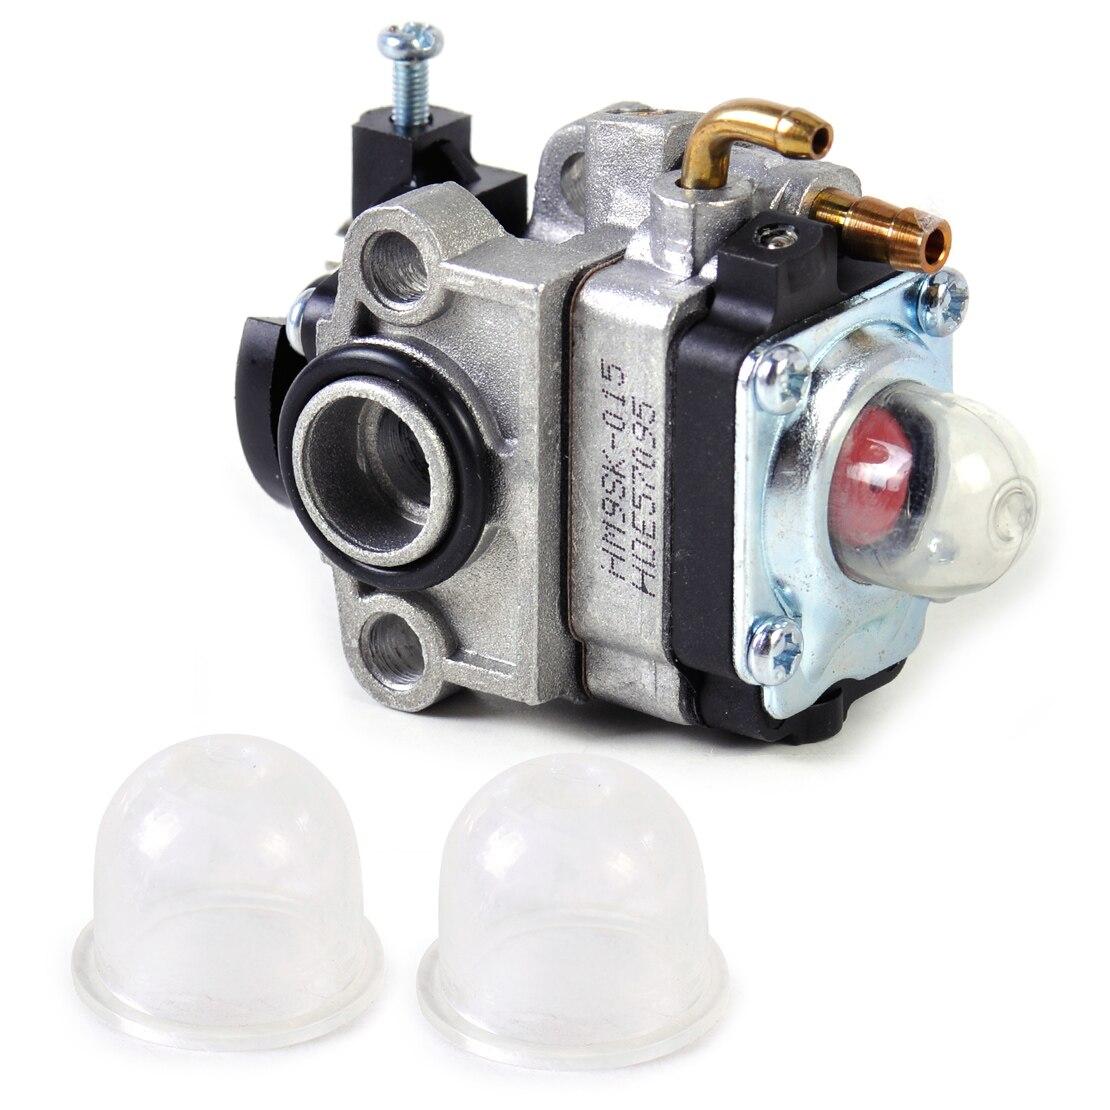 Carburador LETAOSK compatible con Ryobi MTD Bolens troy-bilt Gas Trimmer753-04296 753-04745